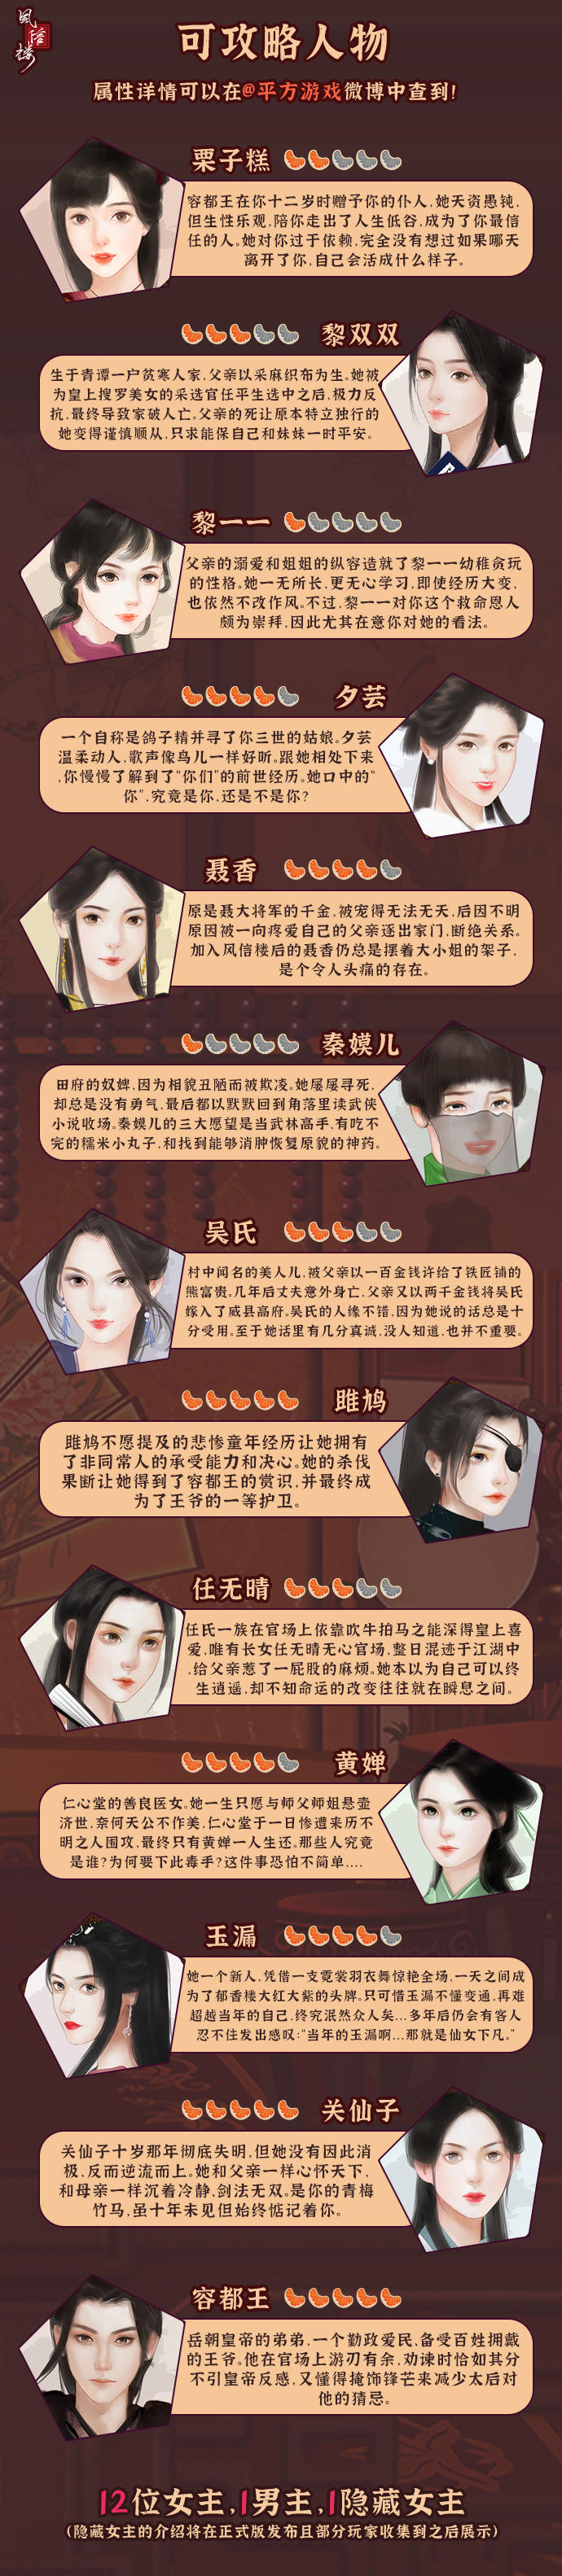 XC_人物介绍.jpg